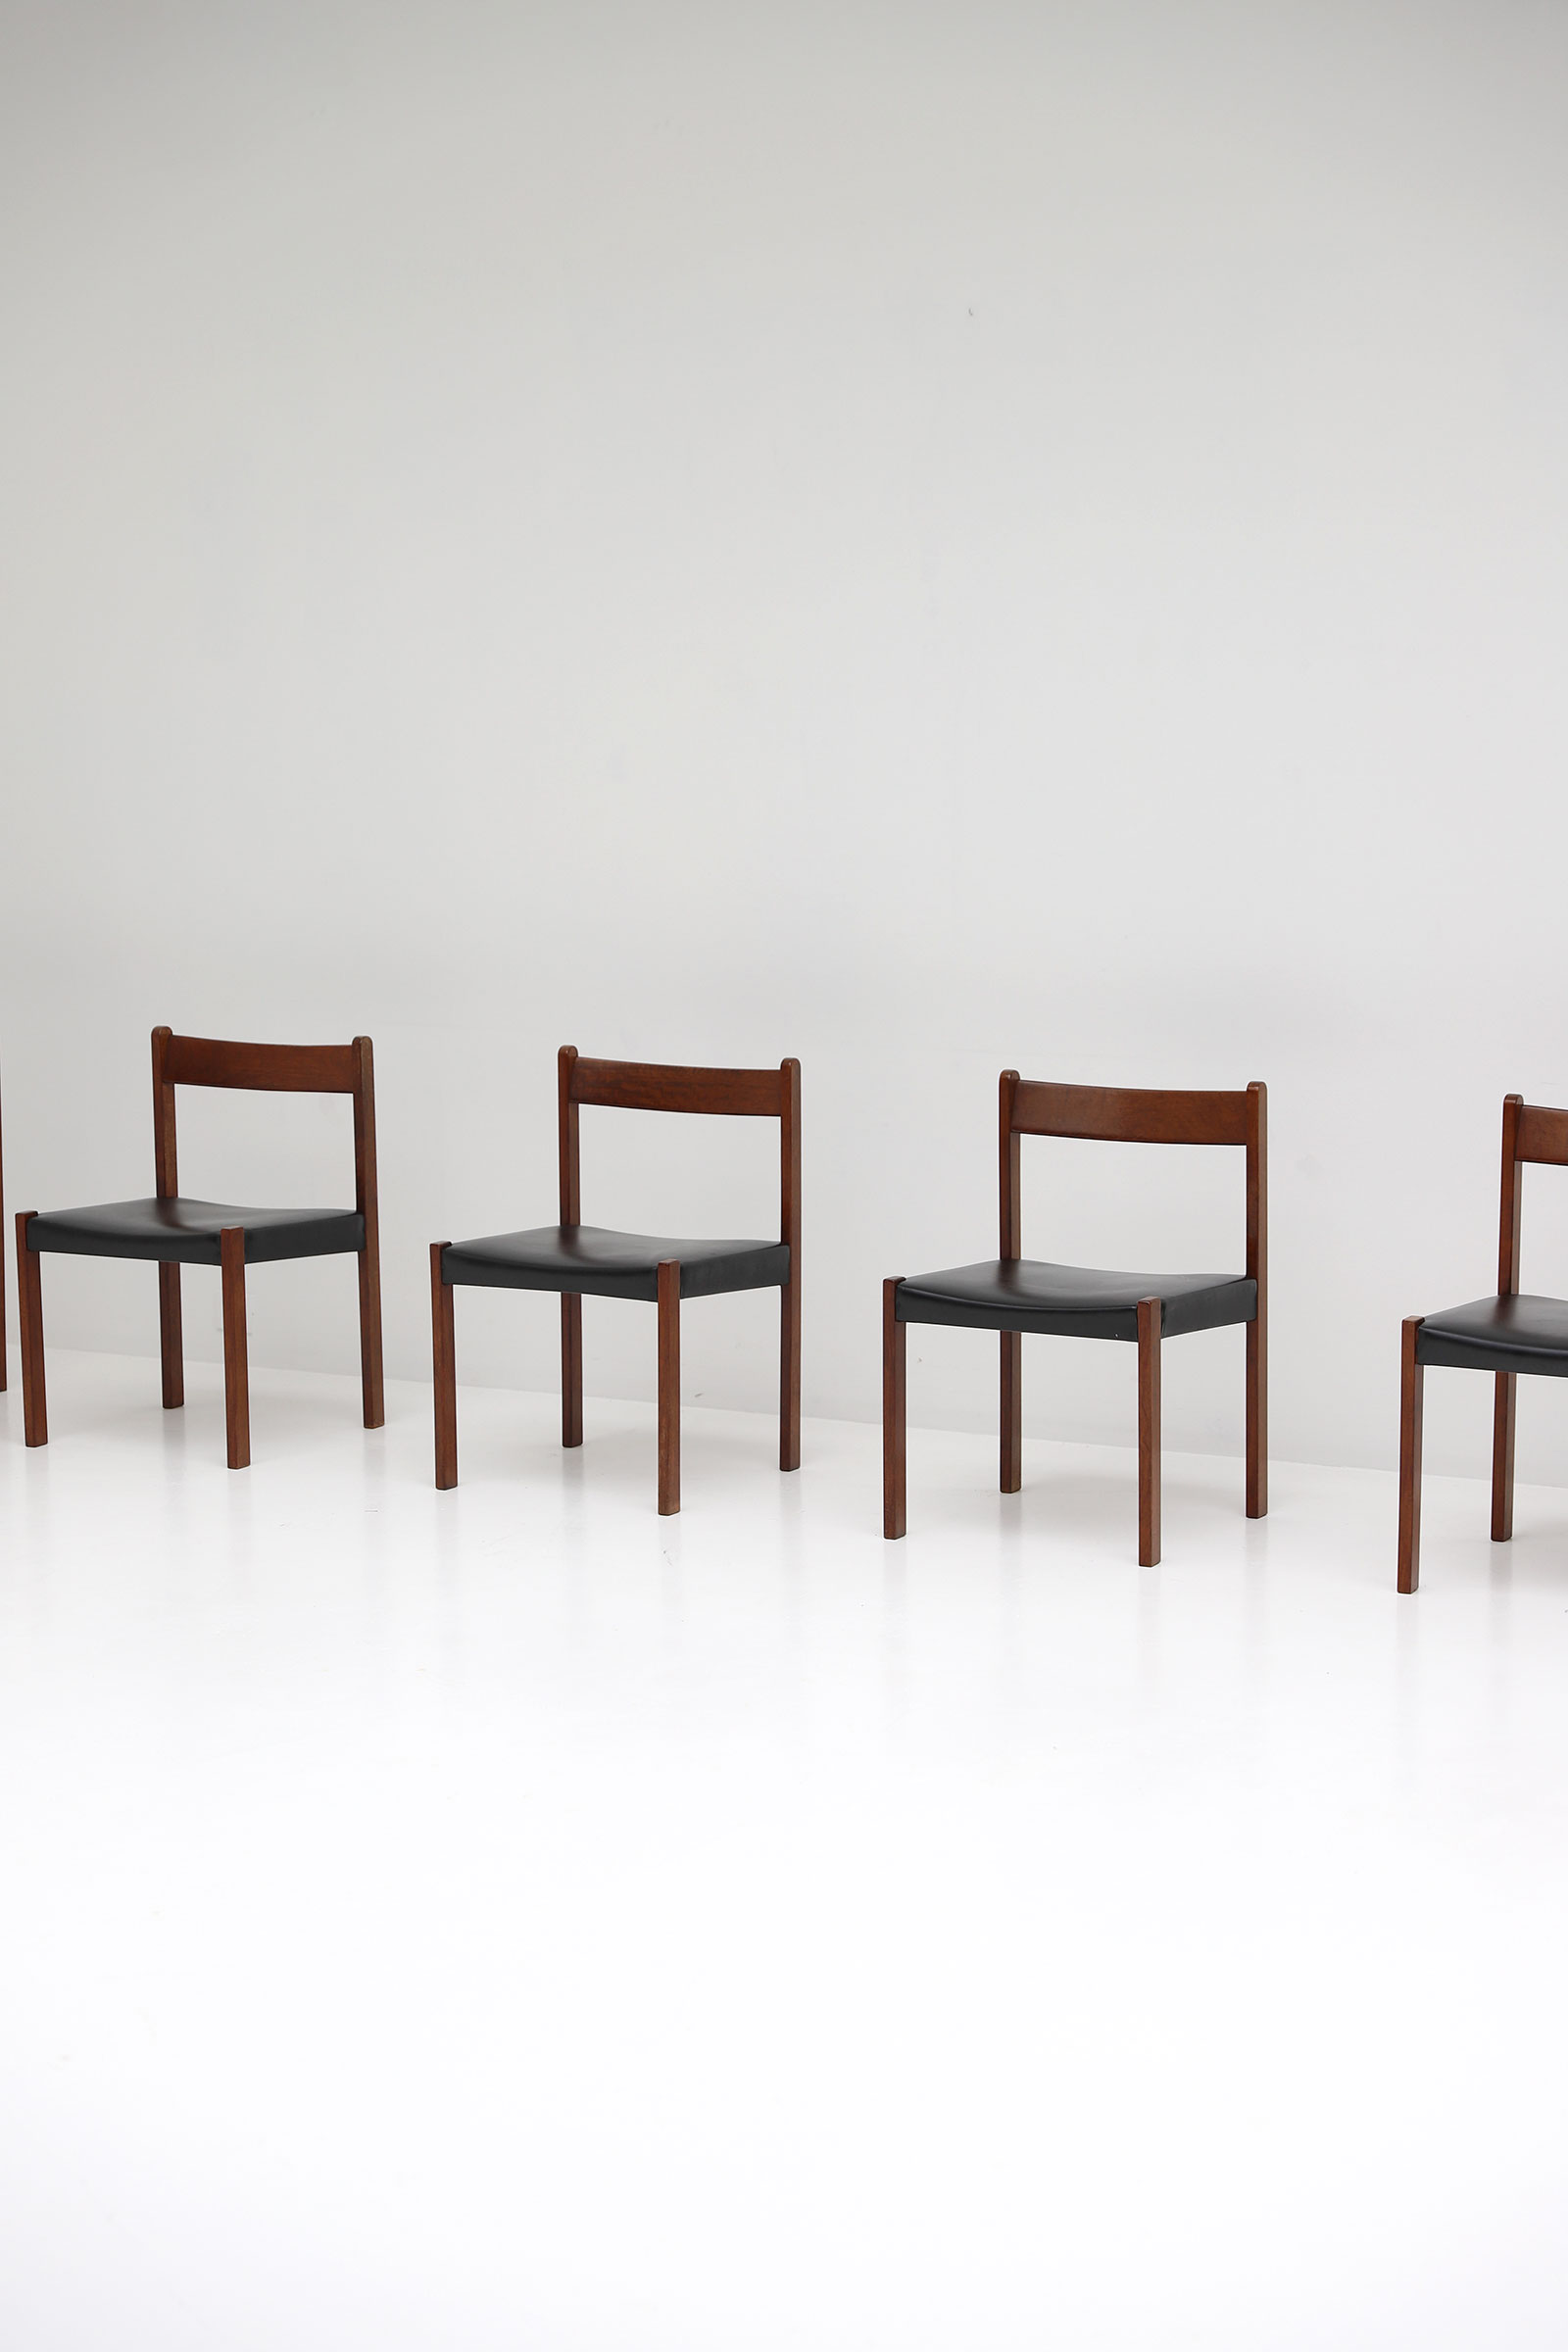 Alfred Hendrickx Belform Chairsimage 2